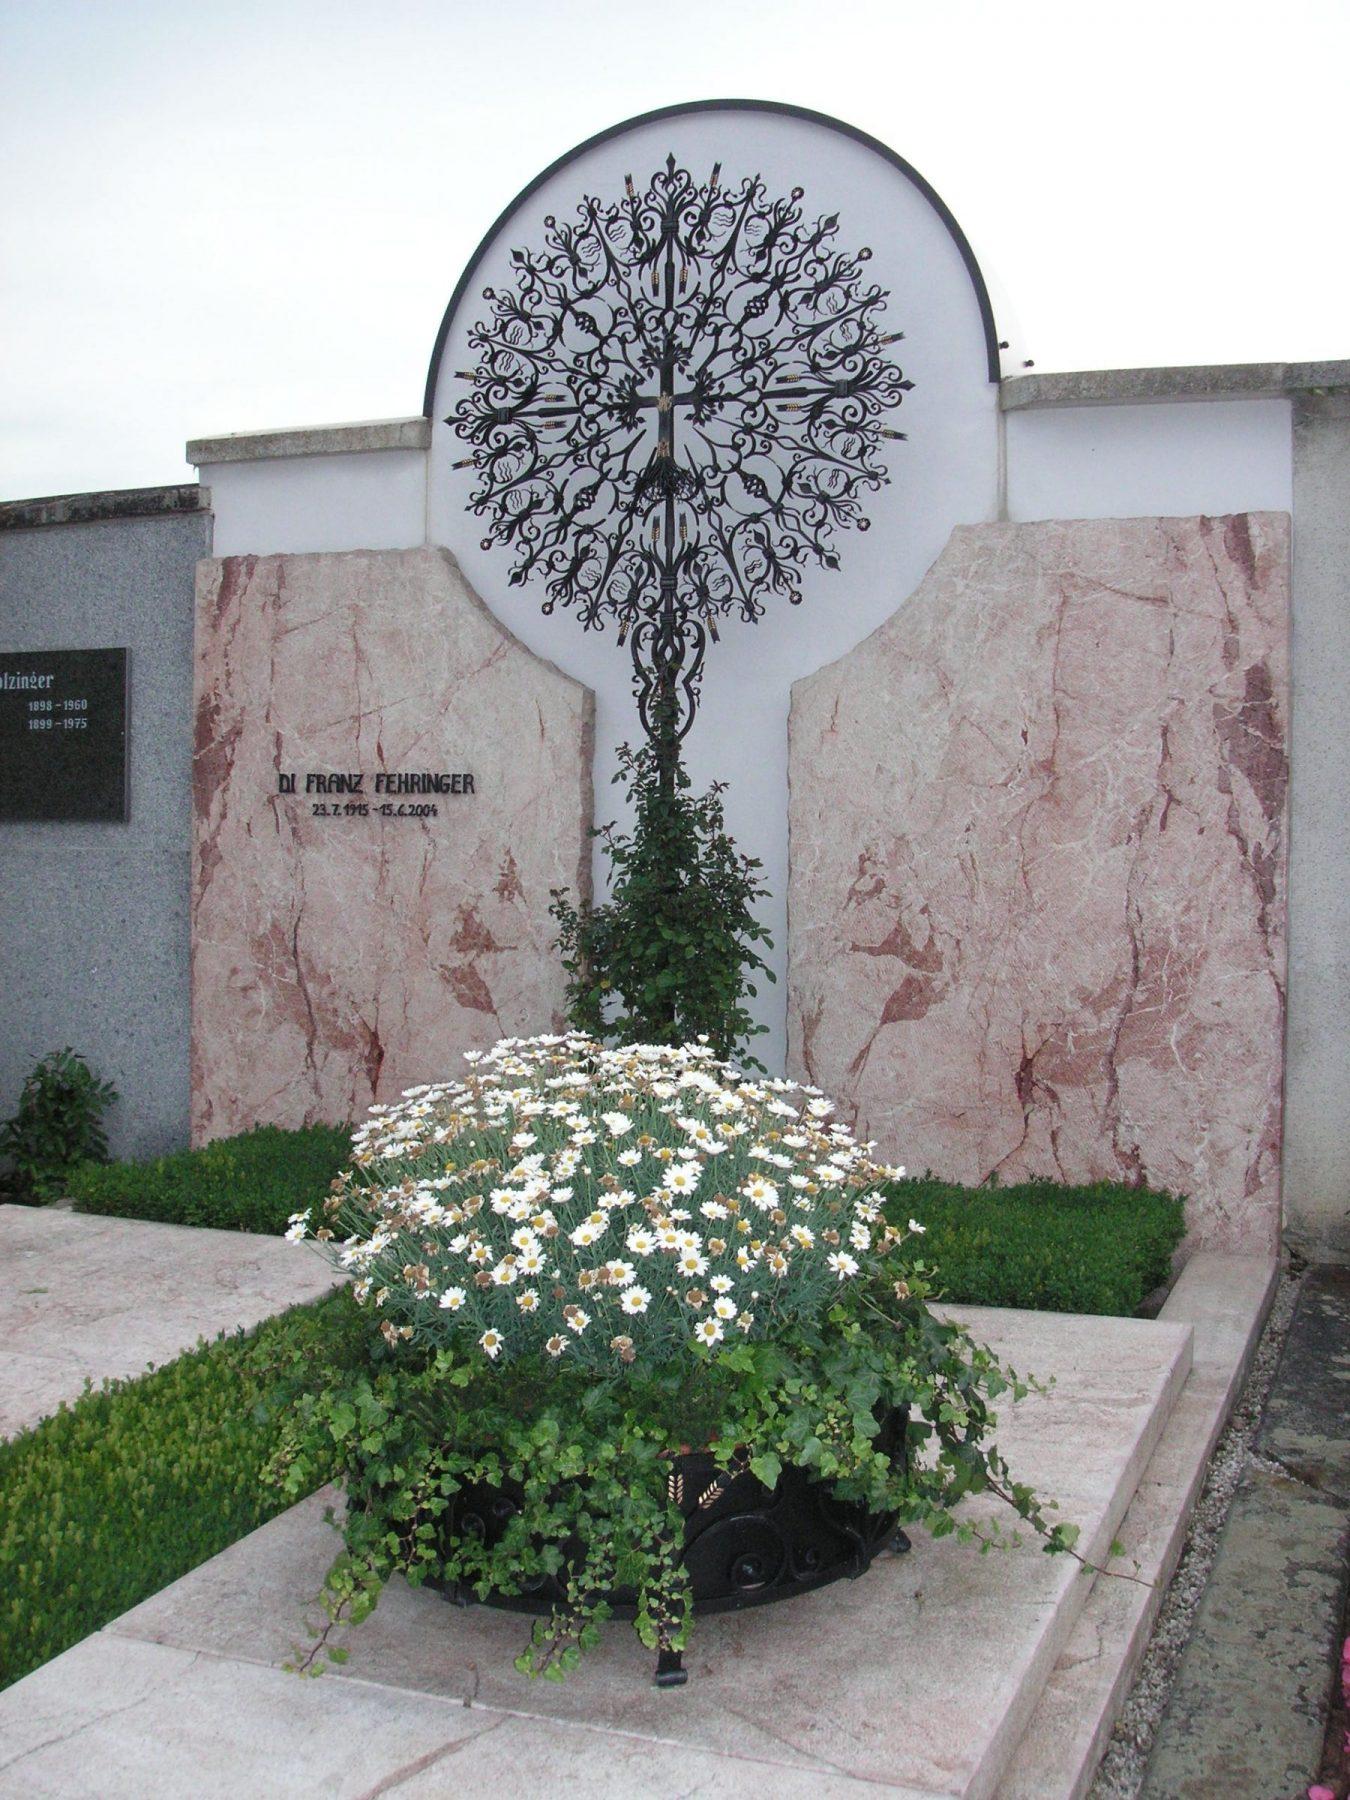 Monstranzkreuz-Lebensbaum